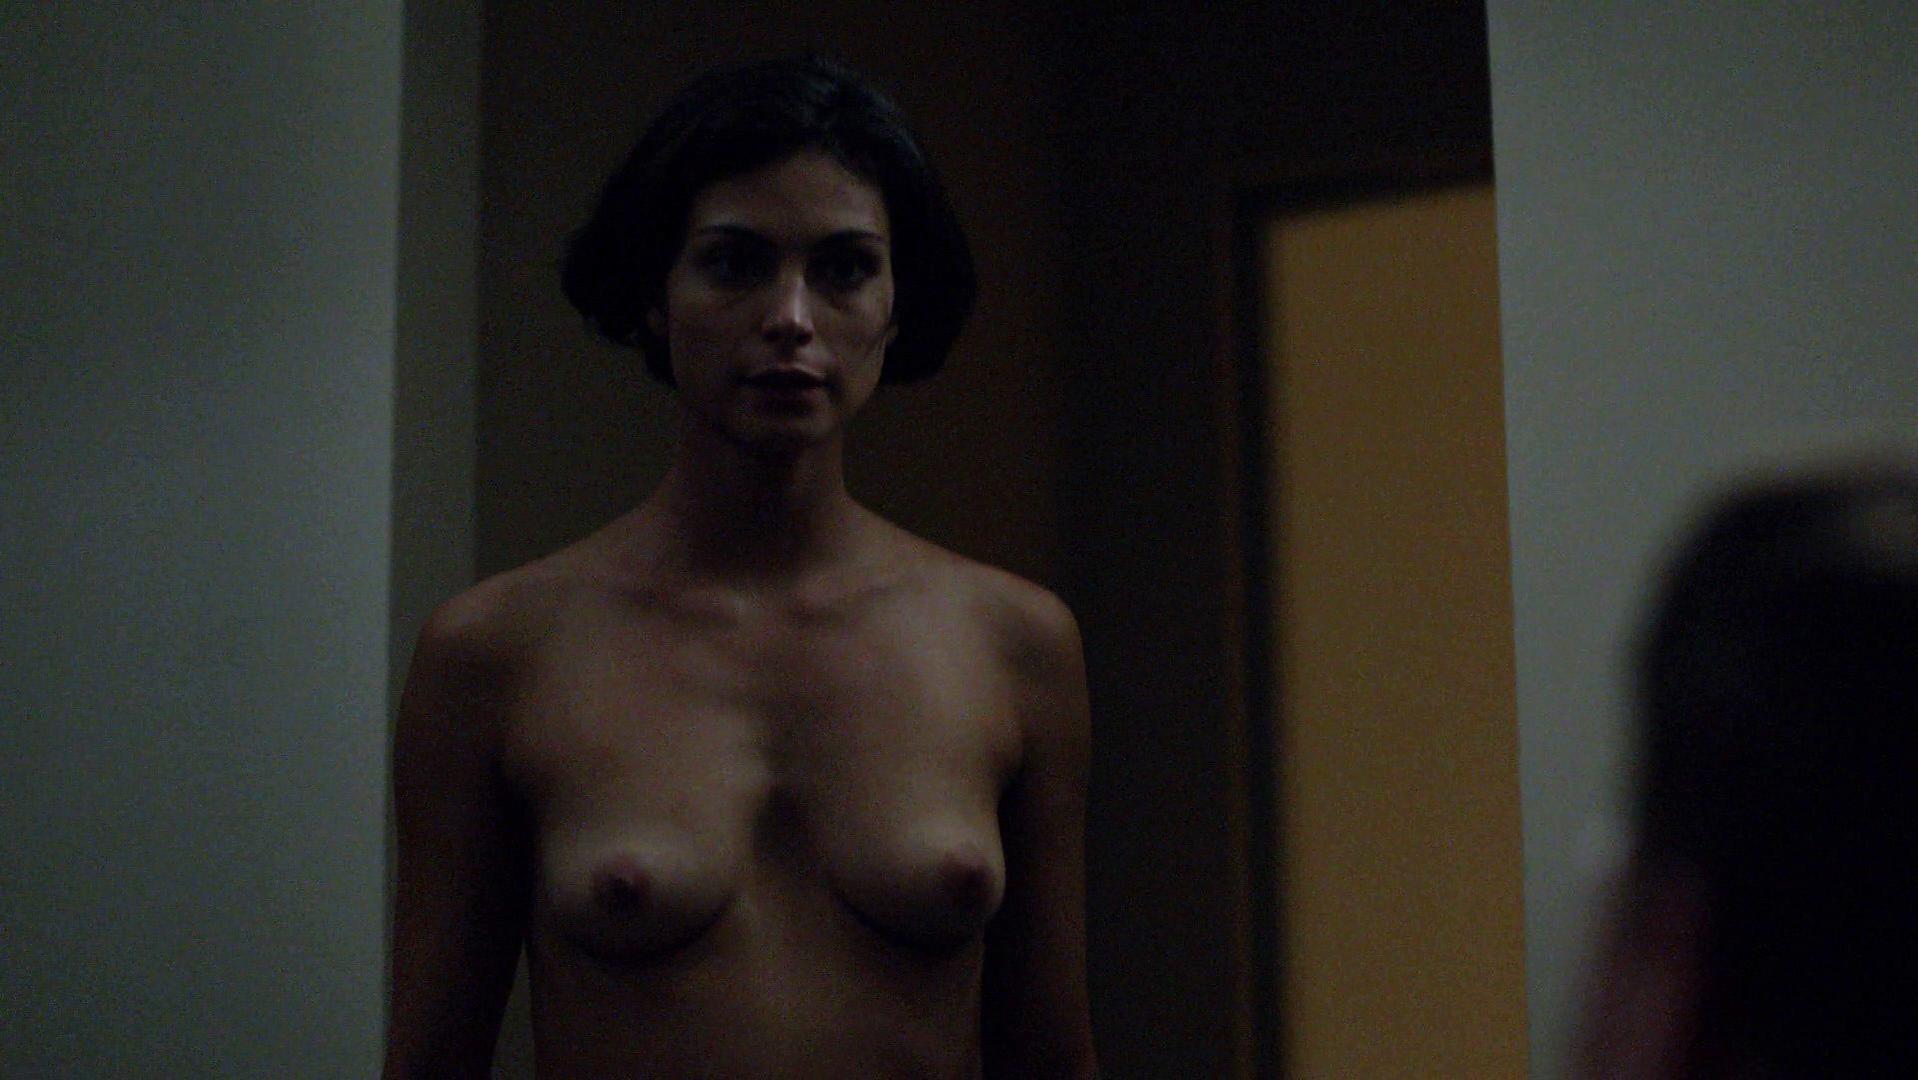 Morena Baccarin nude - Homeland s02e09 (2012)